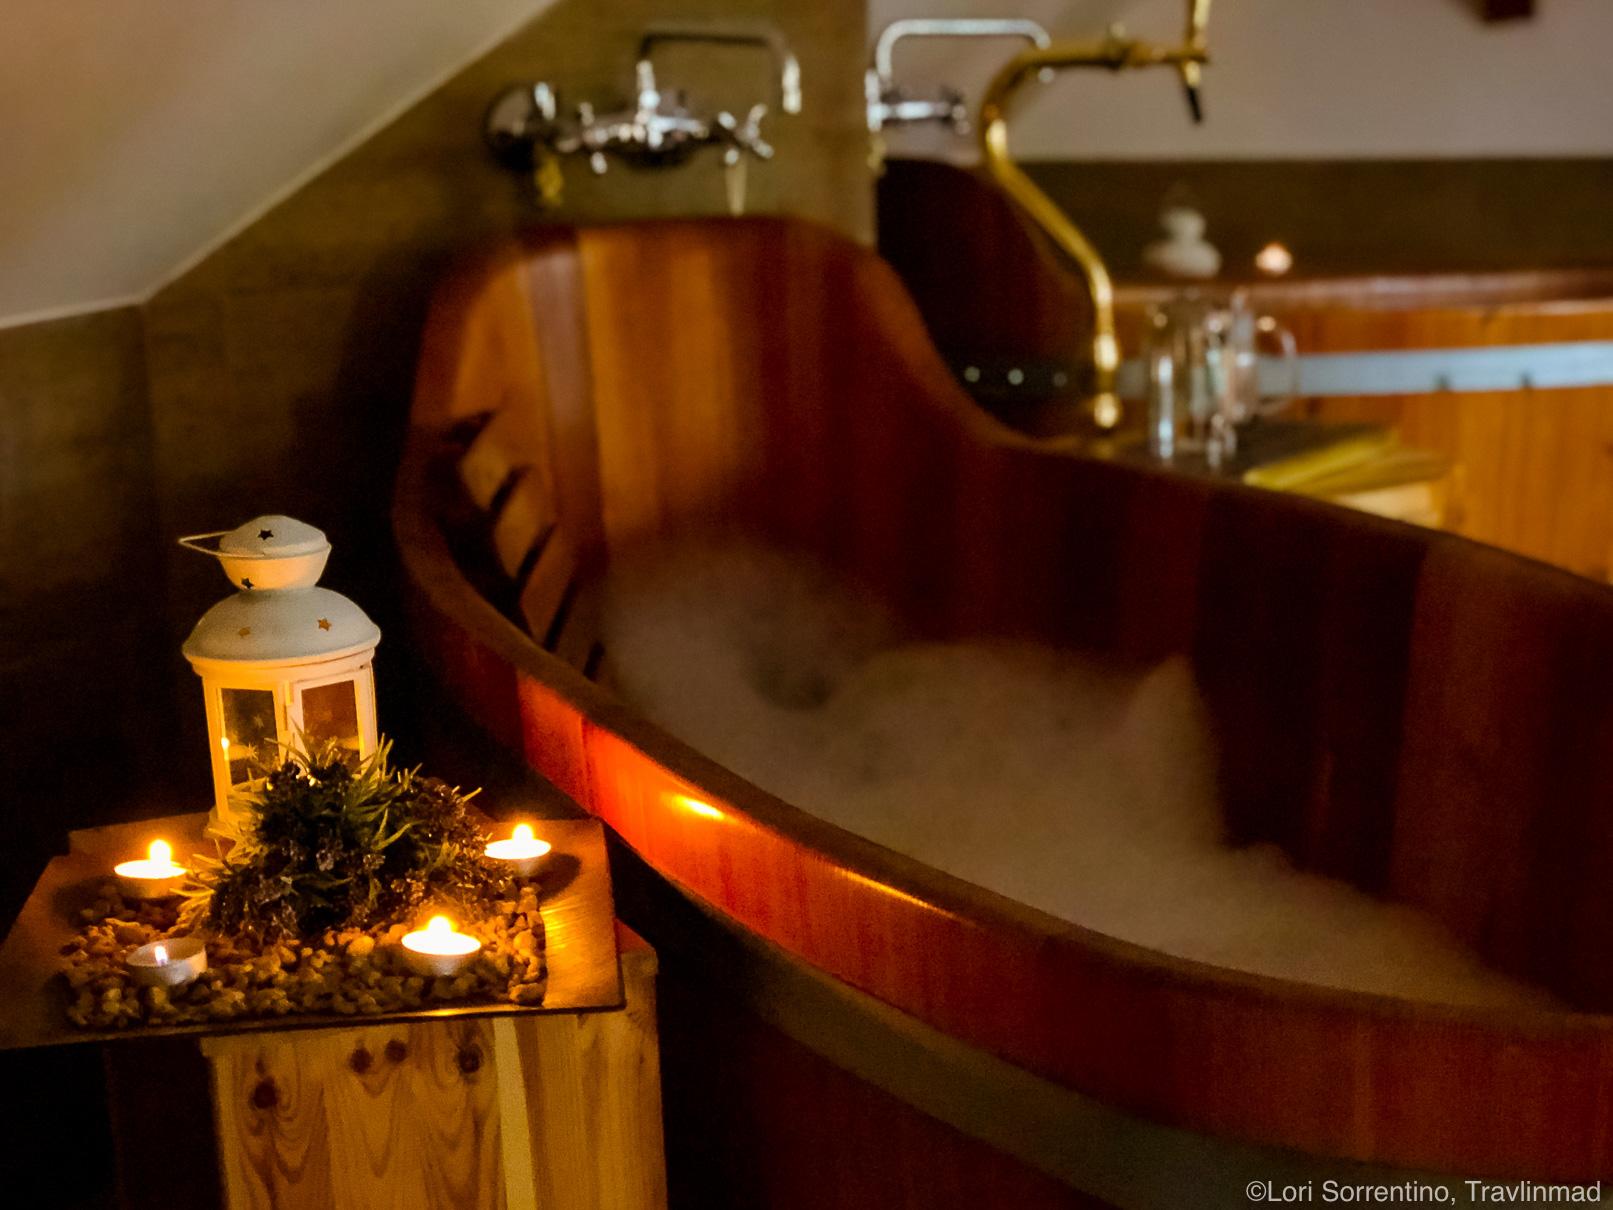 Beer spa at Svachovka hotel near Cesky Krumlov